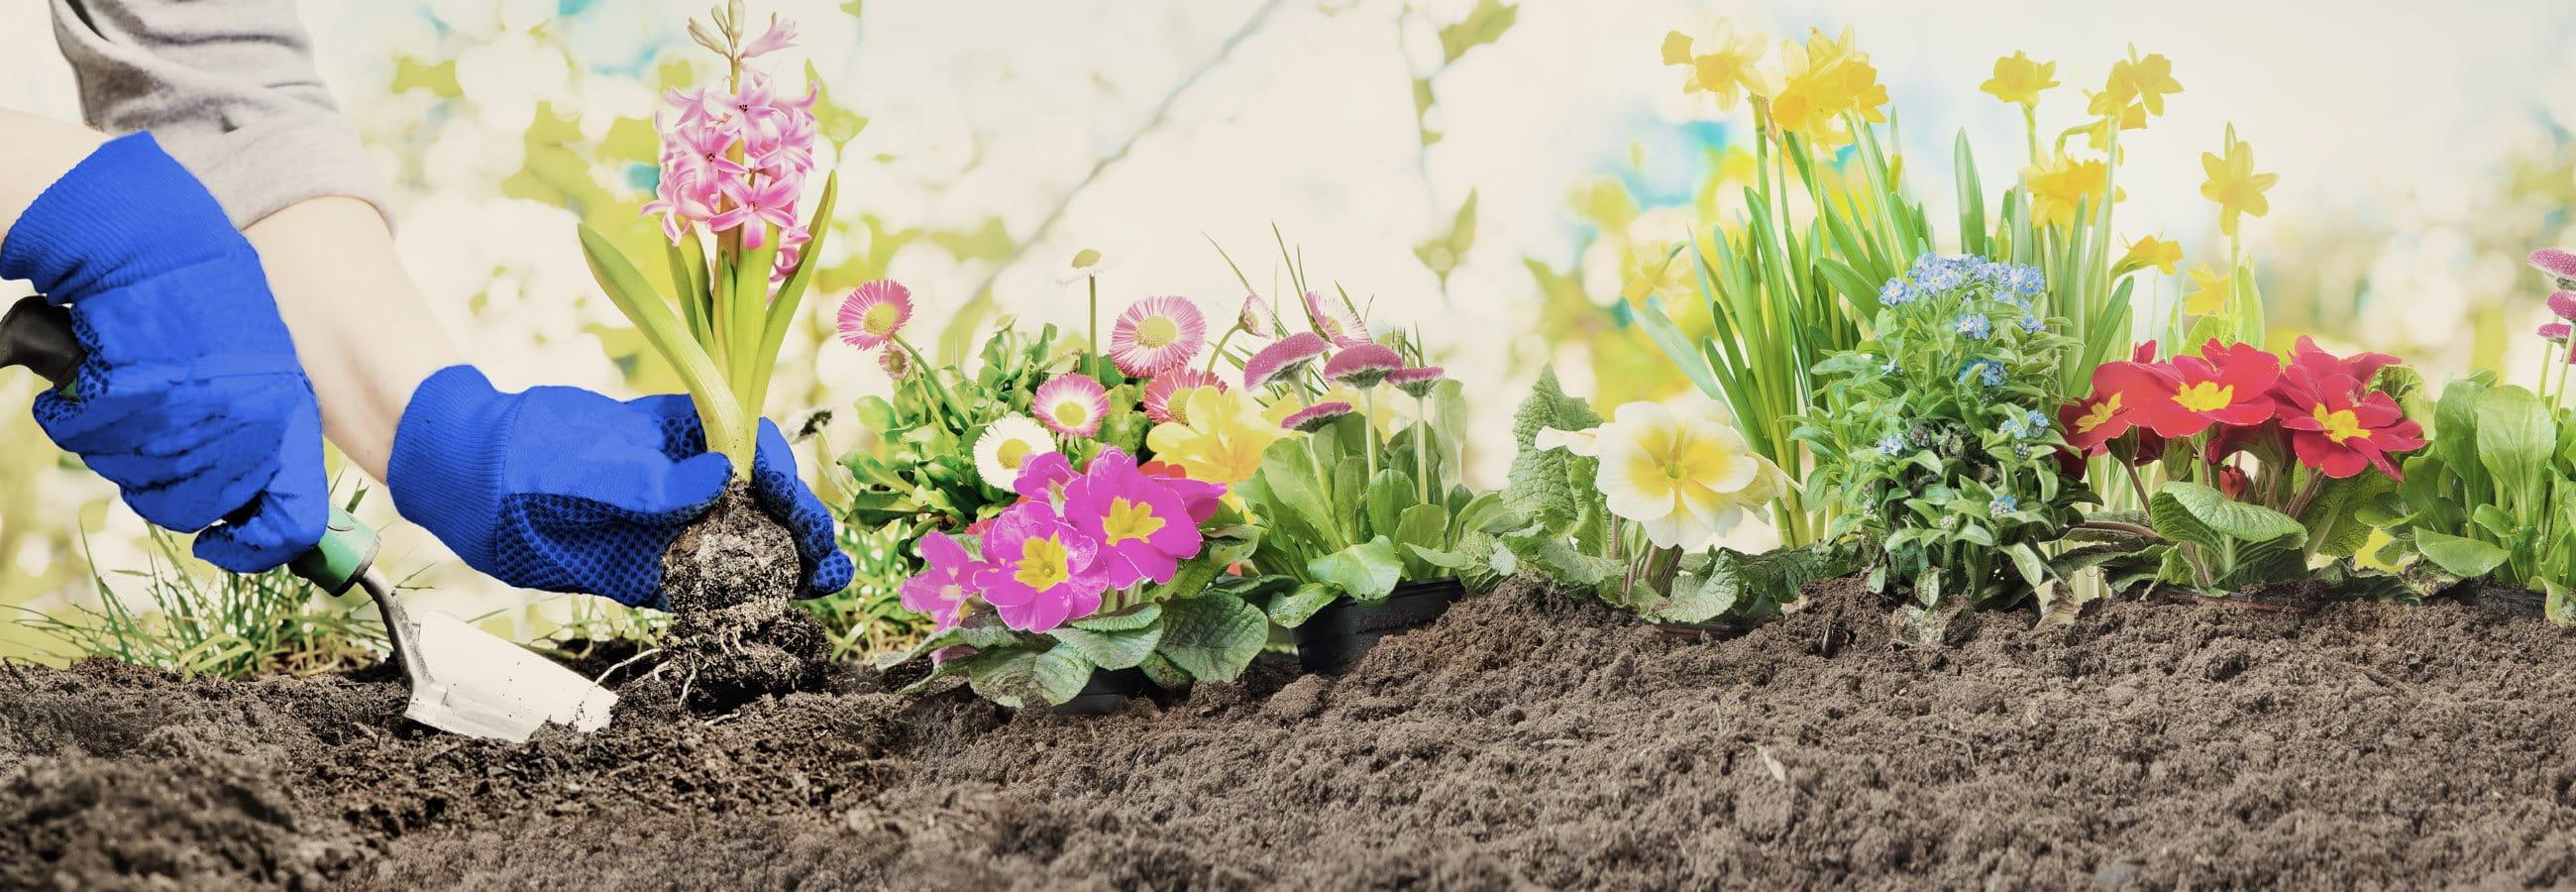 gardening flowers